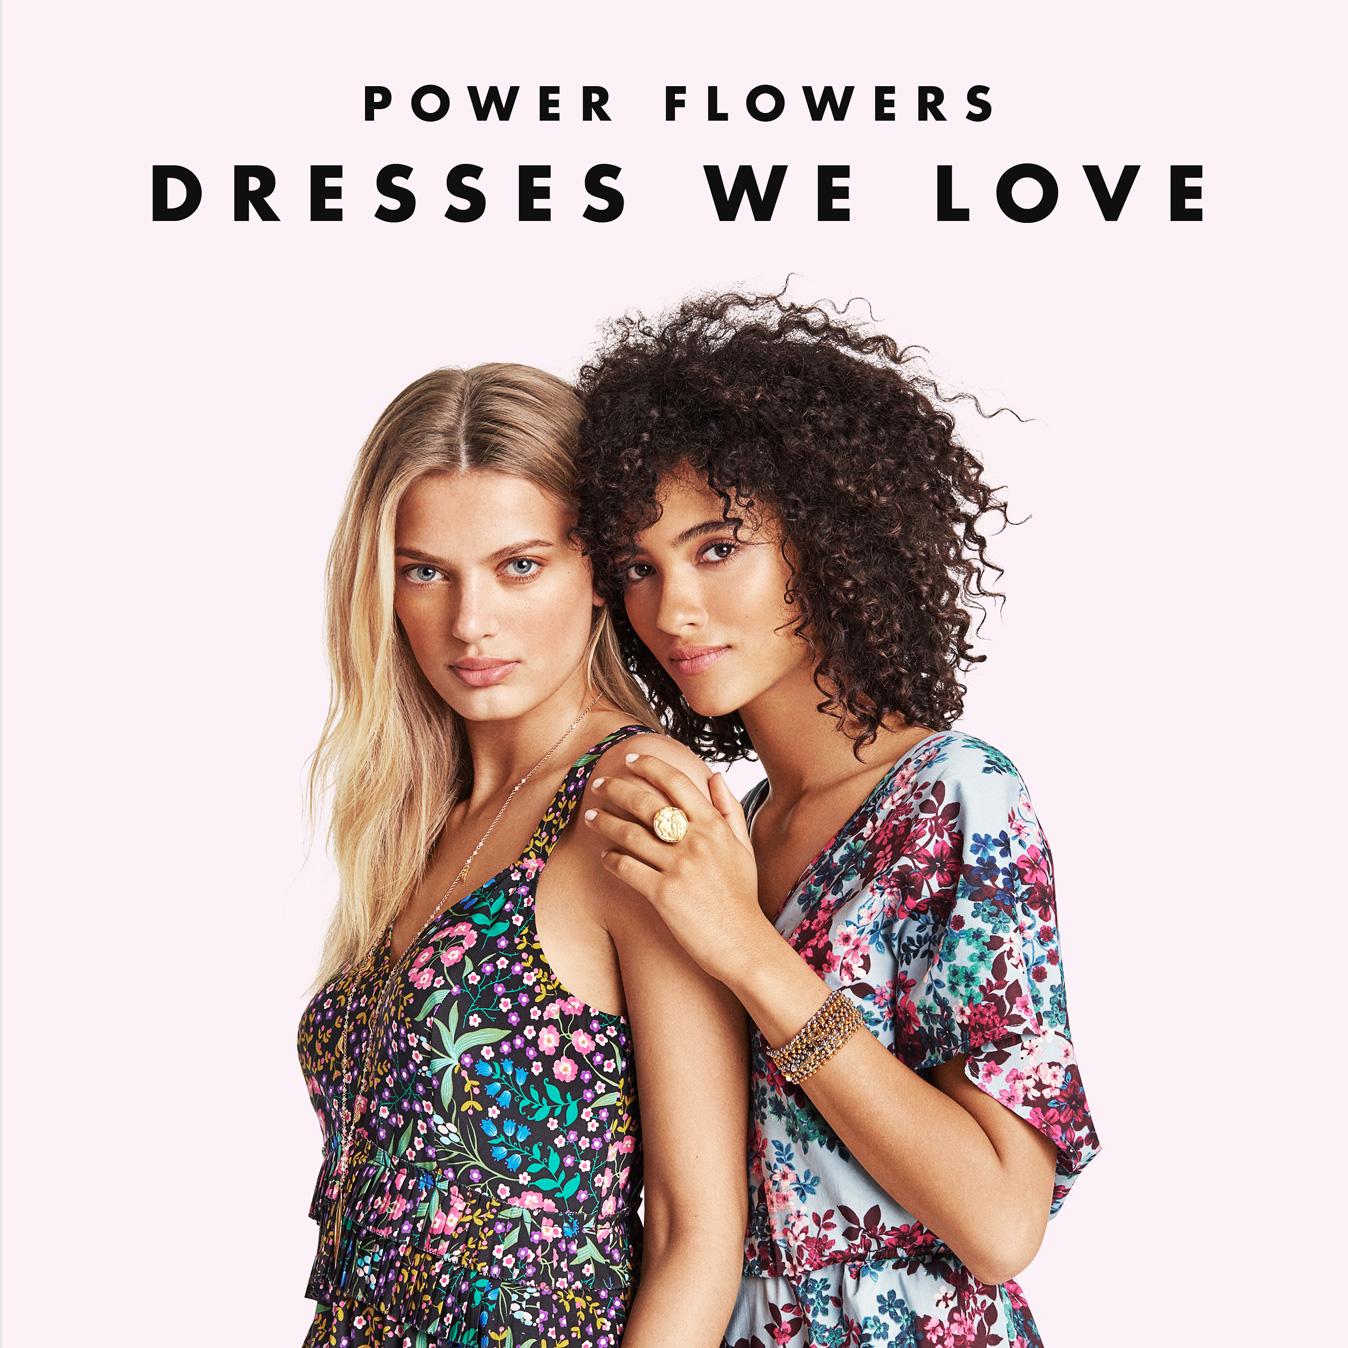 THE WOMEN's SHOP : POWER FLOWERS Dresses We Love